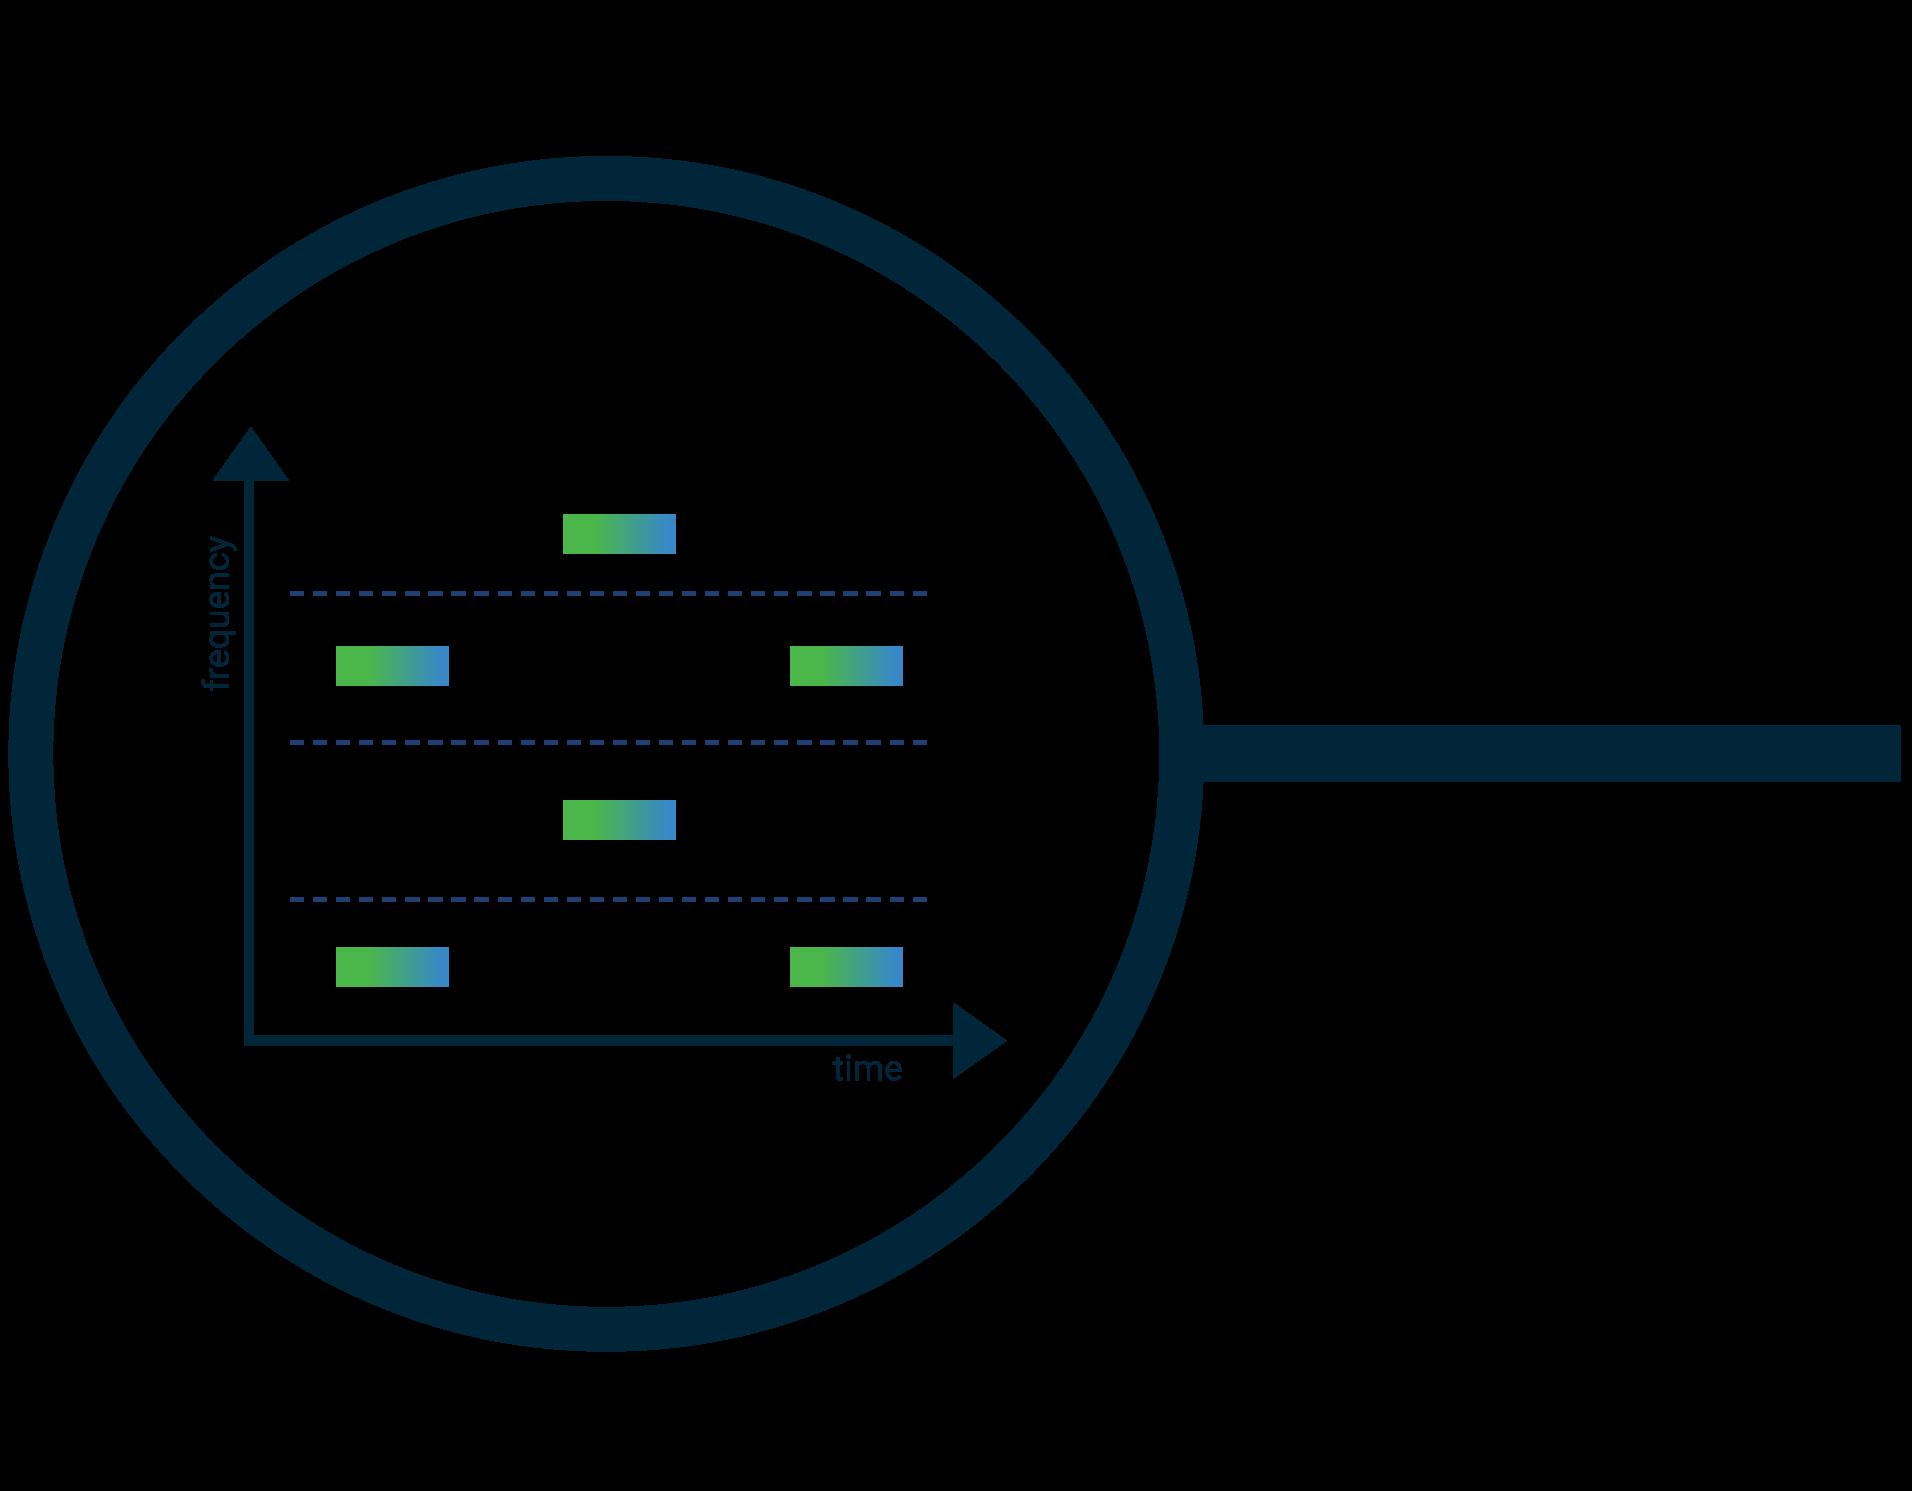 LPWAN solution for Industrial IoT - MIOTY Telegram Splitting